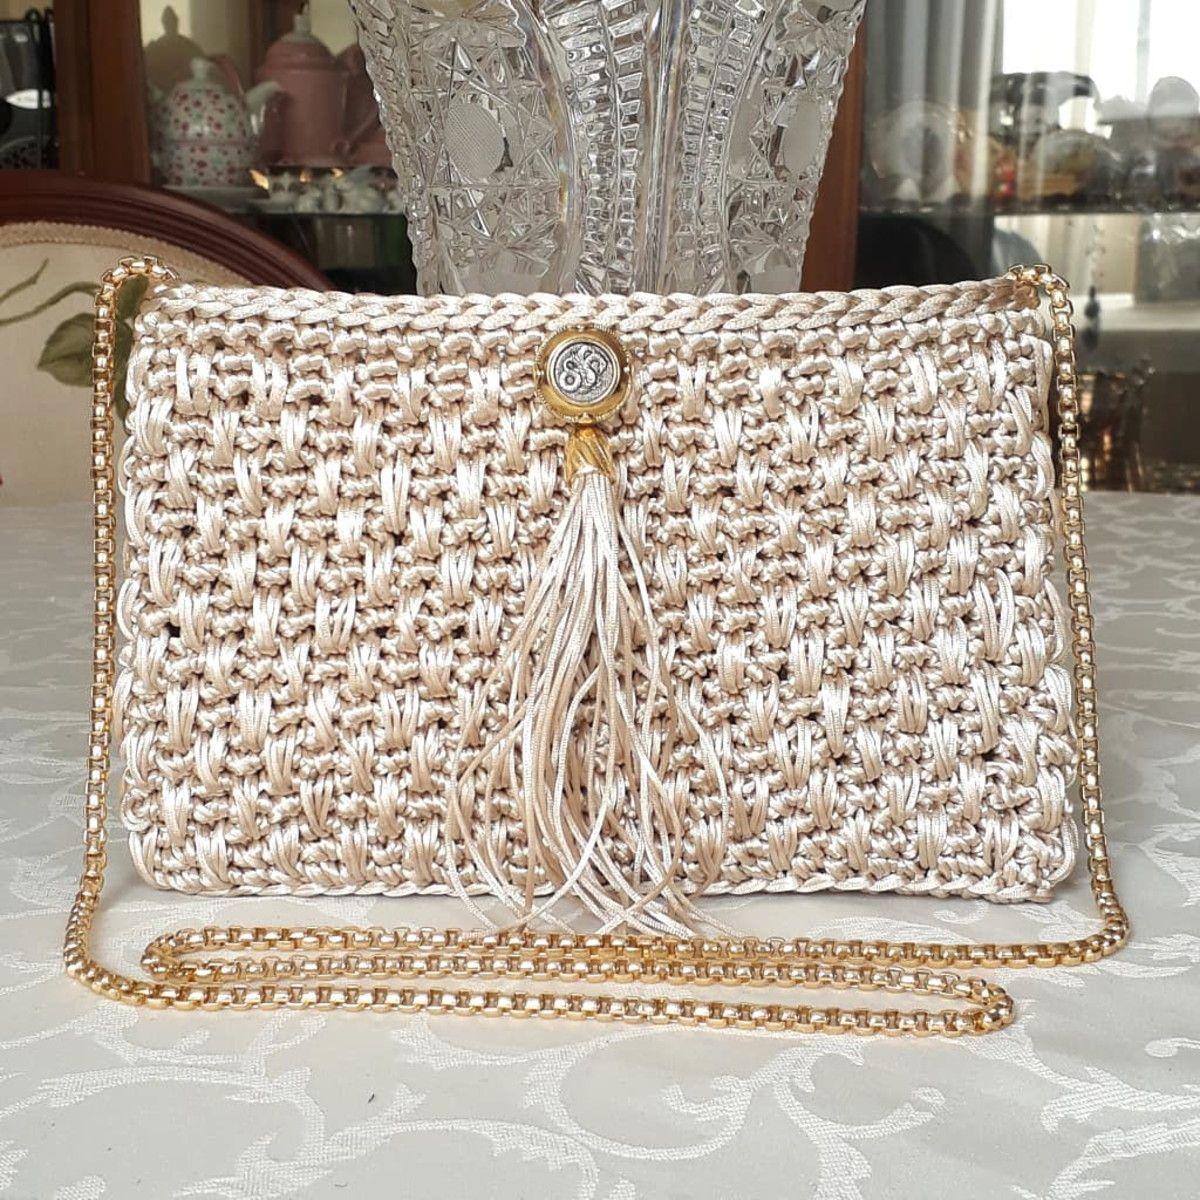 Paris Luxury Beige Hilo de seda Crochet Clutch / Clutch en Elo7 | M.Oliva (1 …